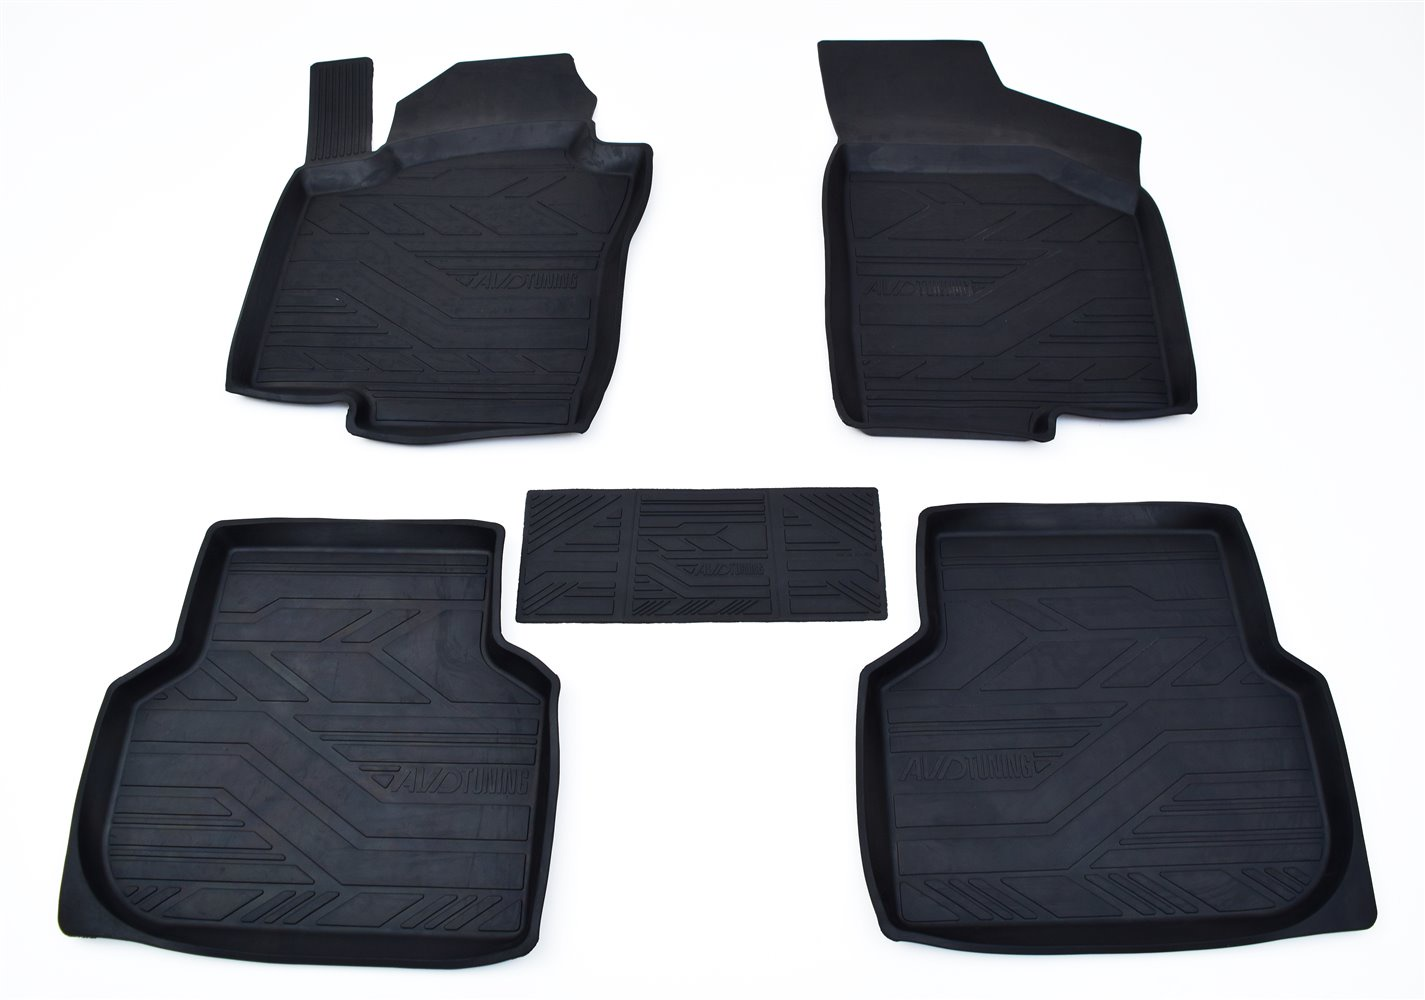 Коврик в багажник Norplast npa00-e31-520 коврик багажника norplast для jeep grand cherokee wk 2010 npa00 t40 100 b бежевый